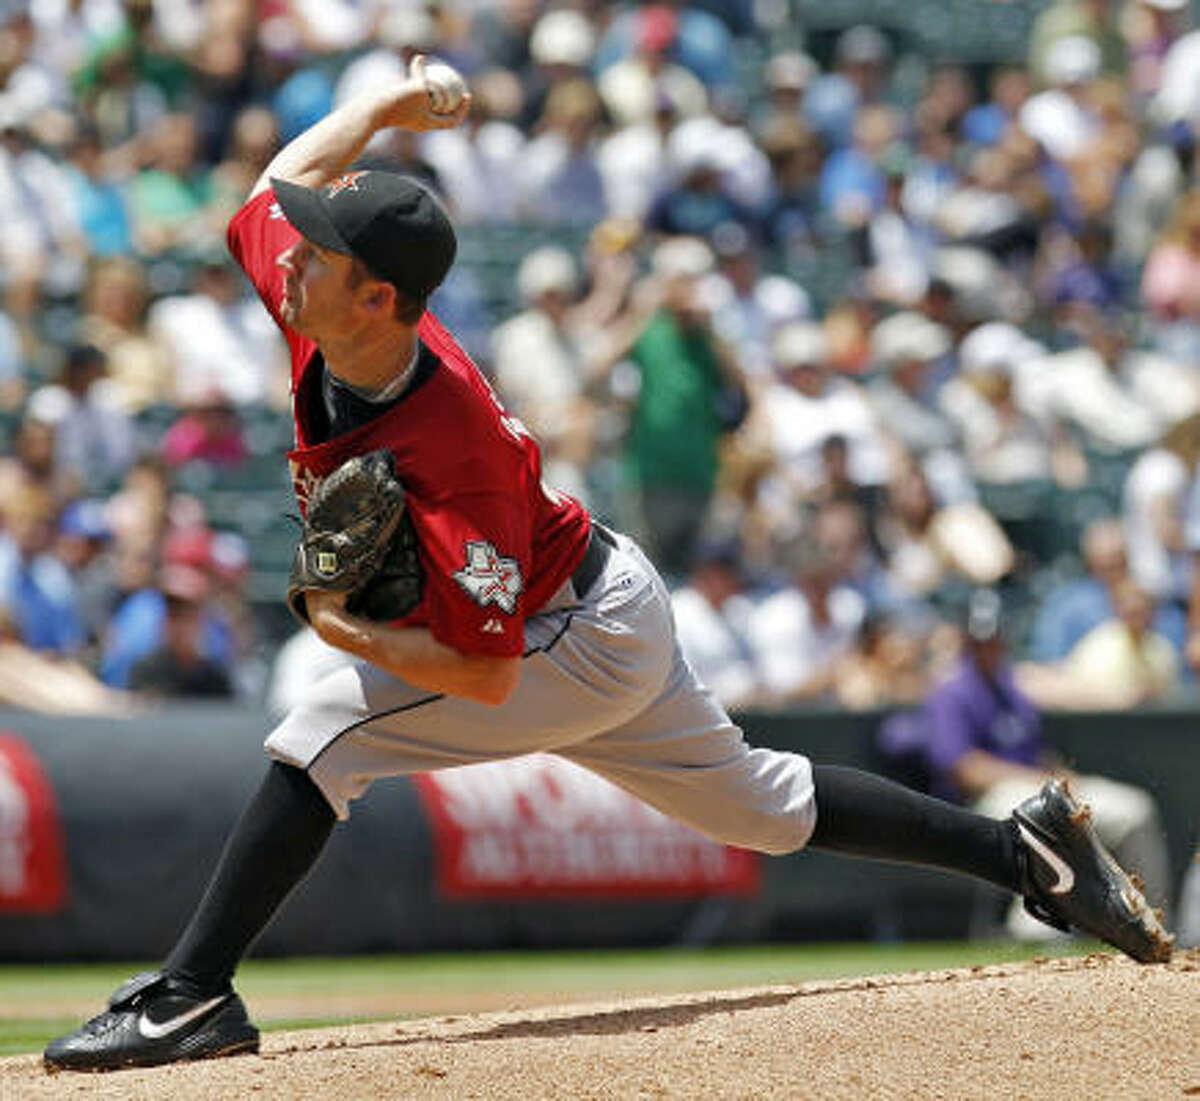 Astros starting pitcher Roy Oswalt threw nine strikeouts, tying a season-high against the Rockies.